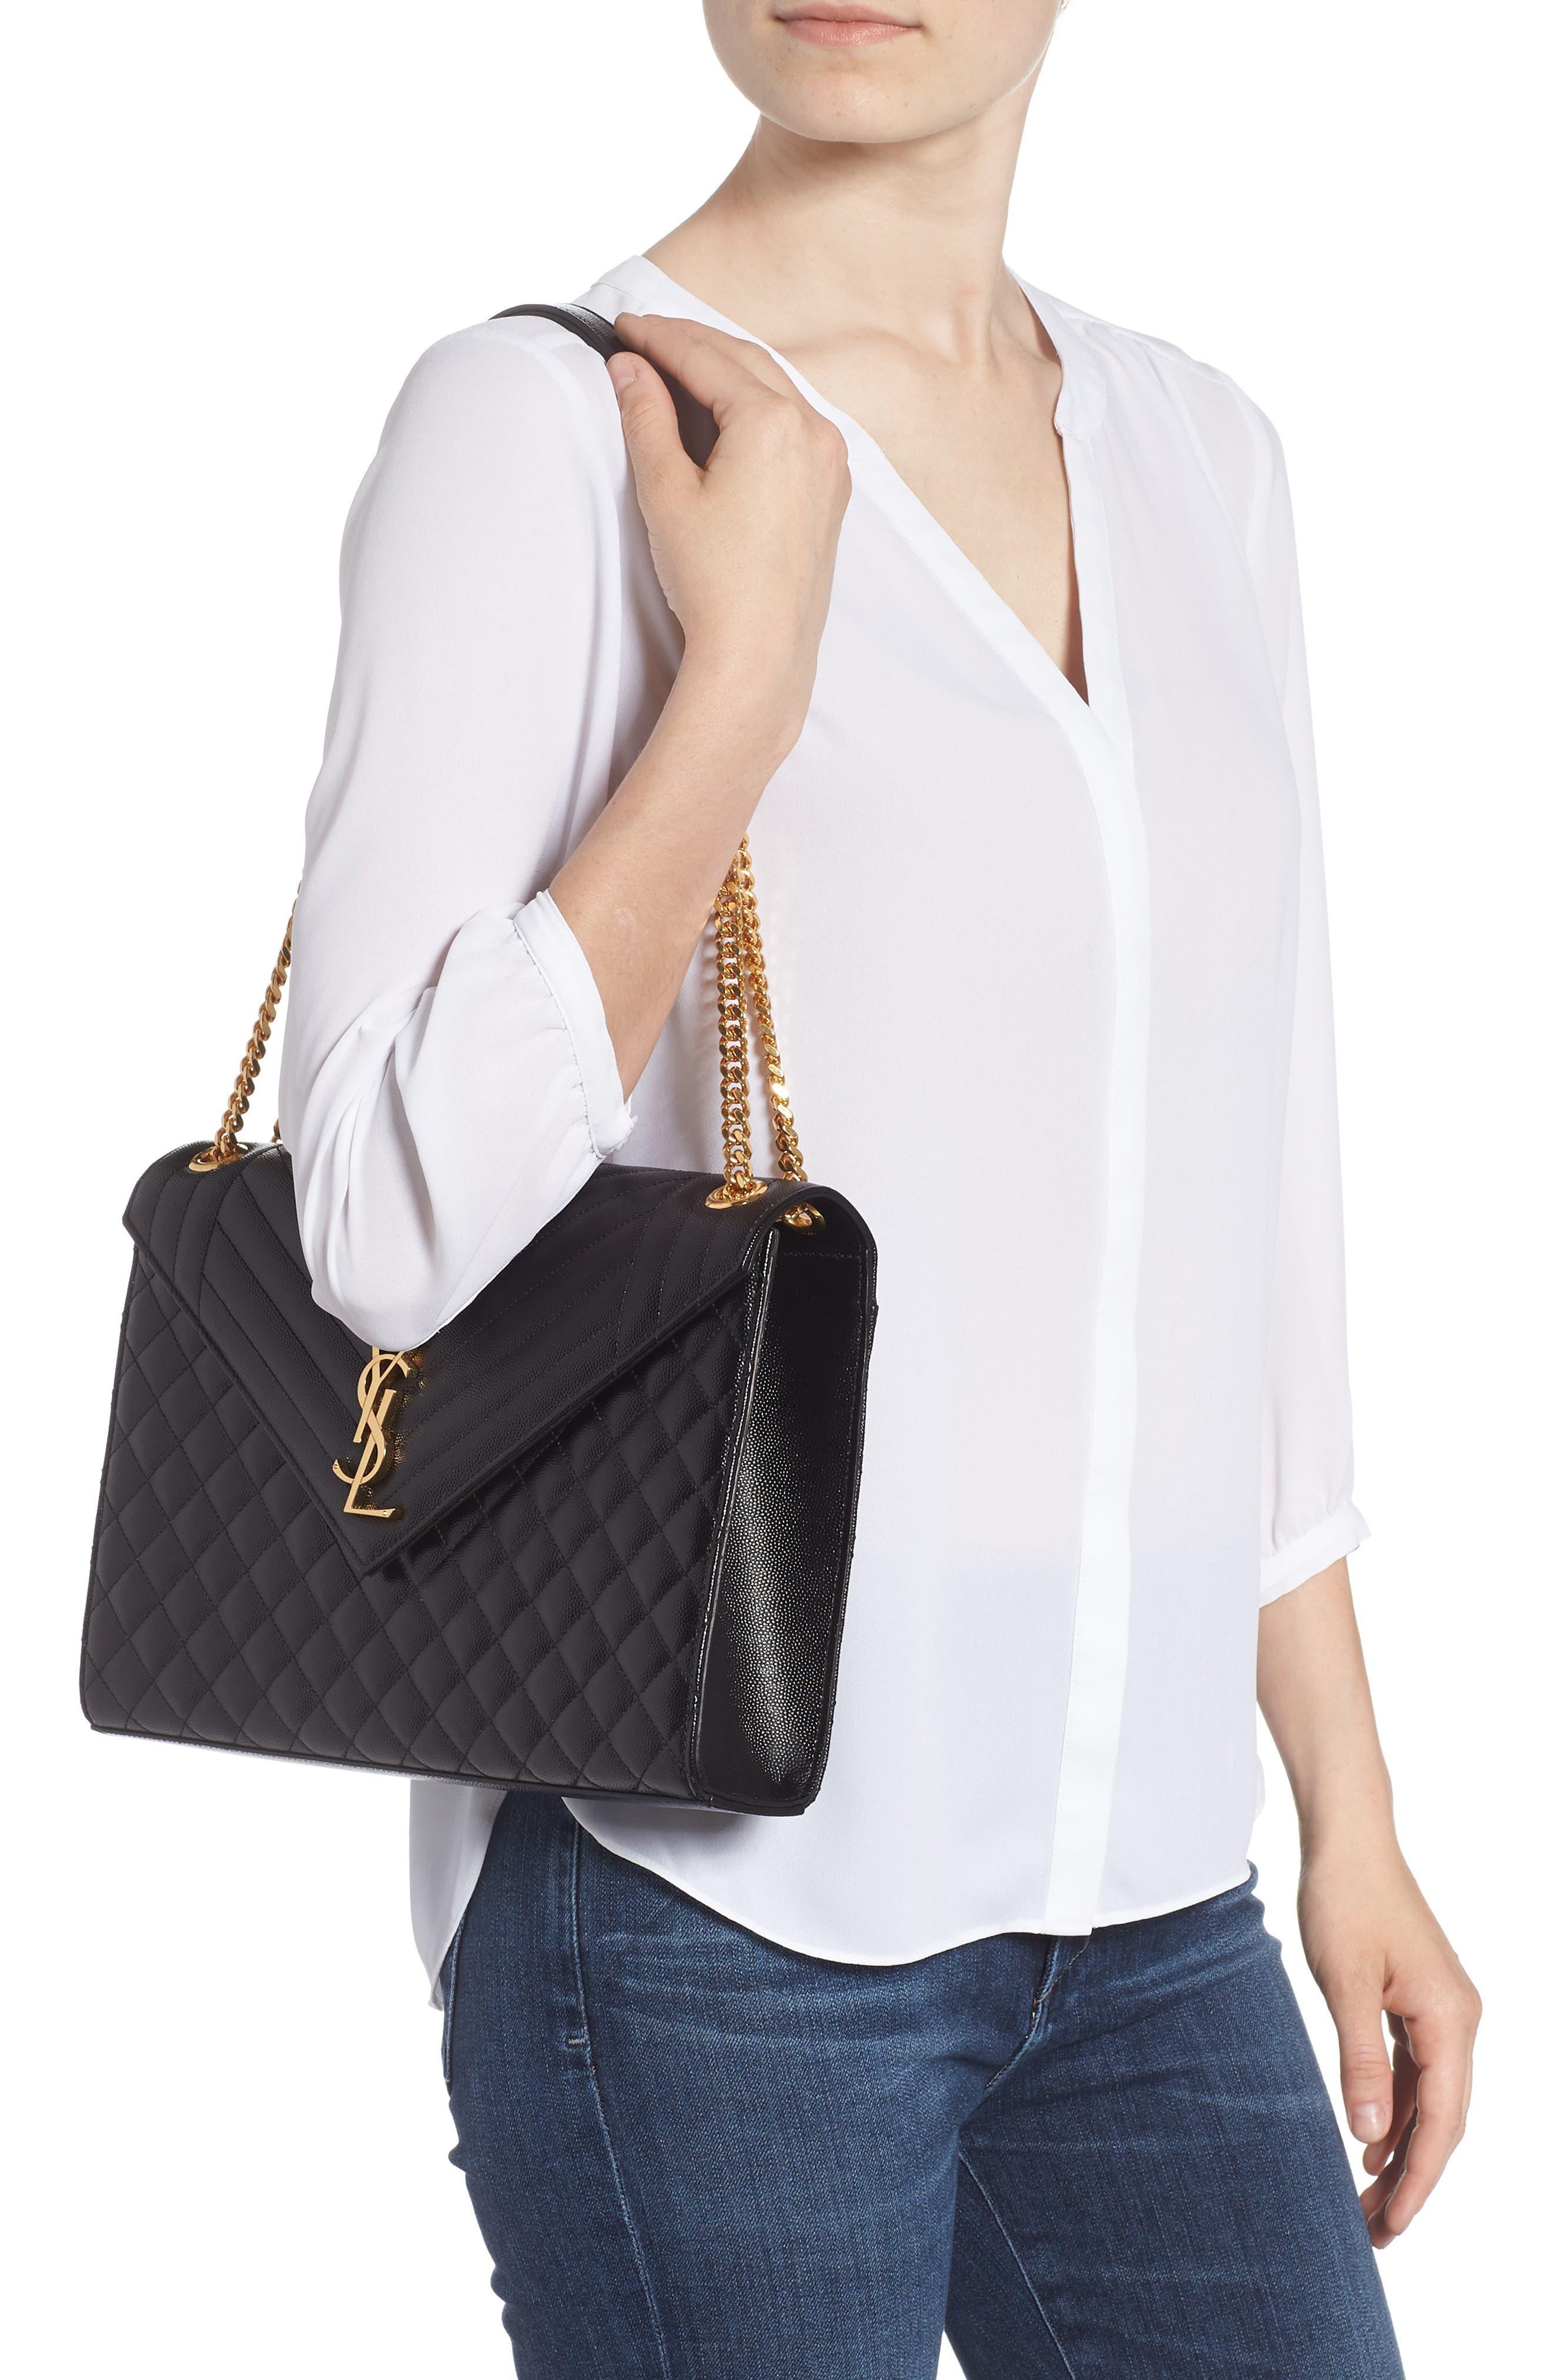 Large Cassandra Calfskin Shoulder Bag,                             Alternate thumbnail 2, color,                             NERO/ NERO/ NERO